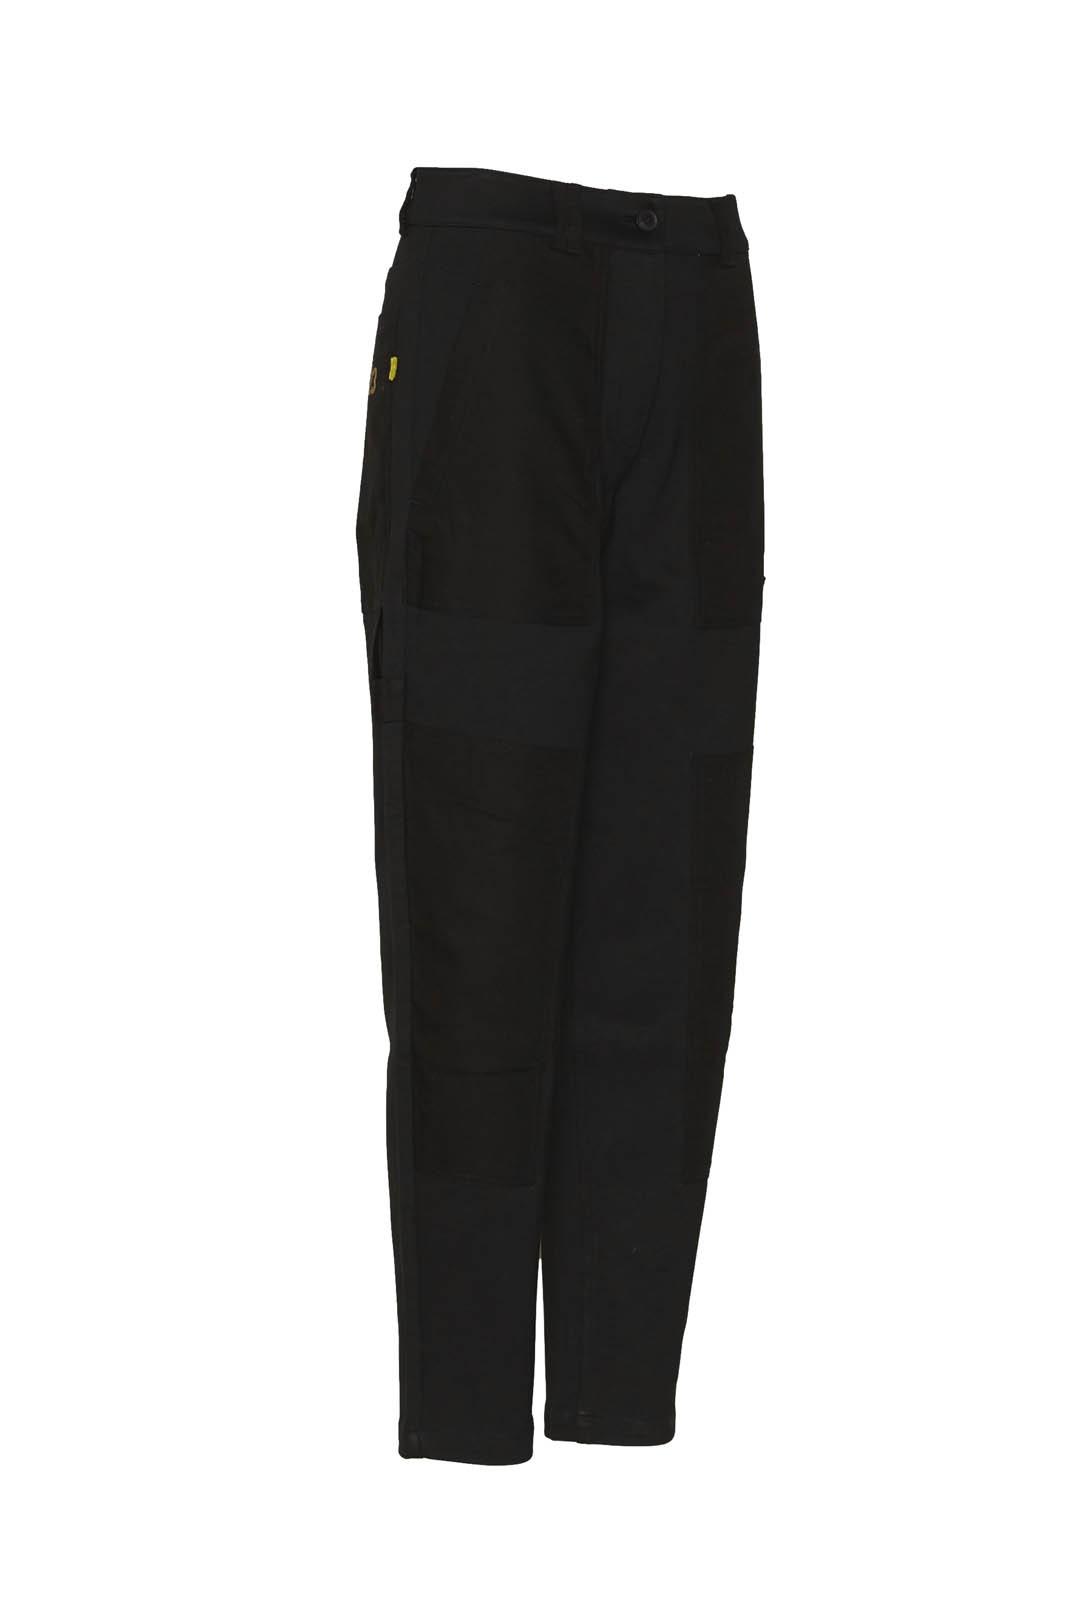 Pantalone in felpa punto milano          3